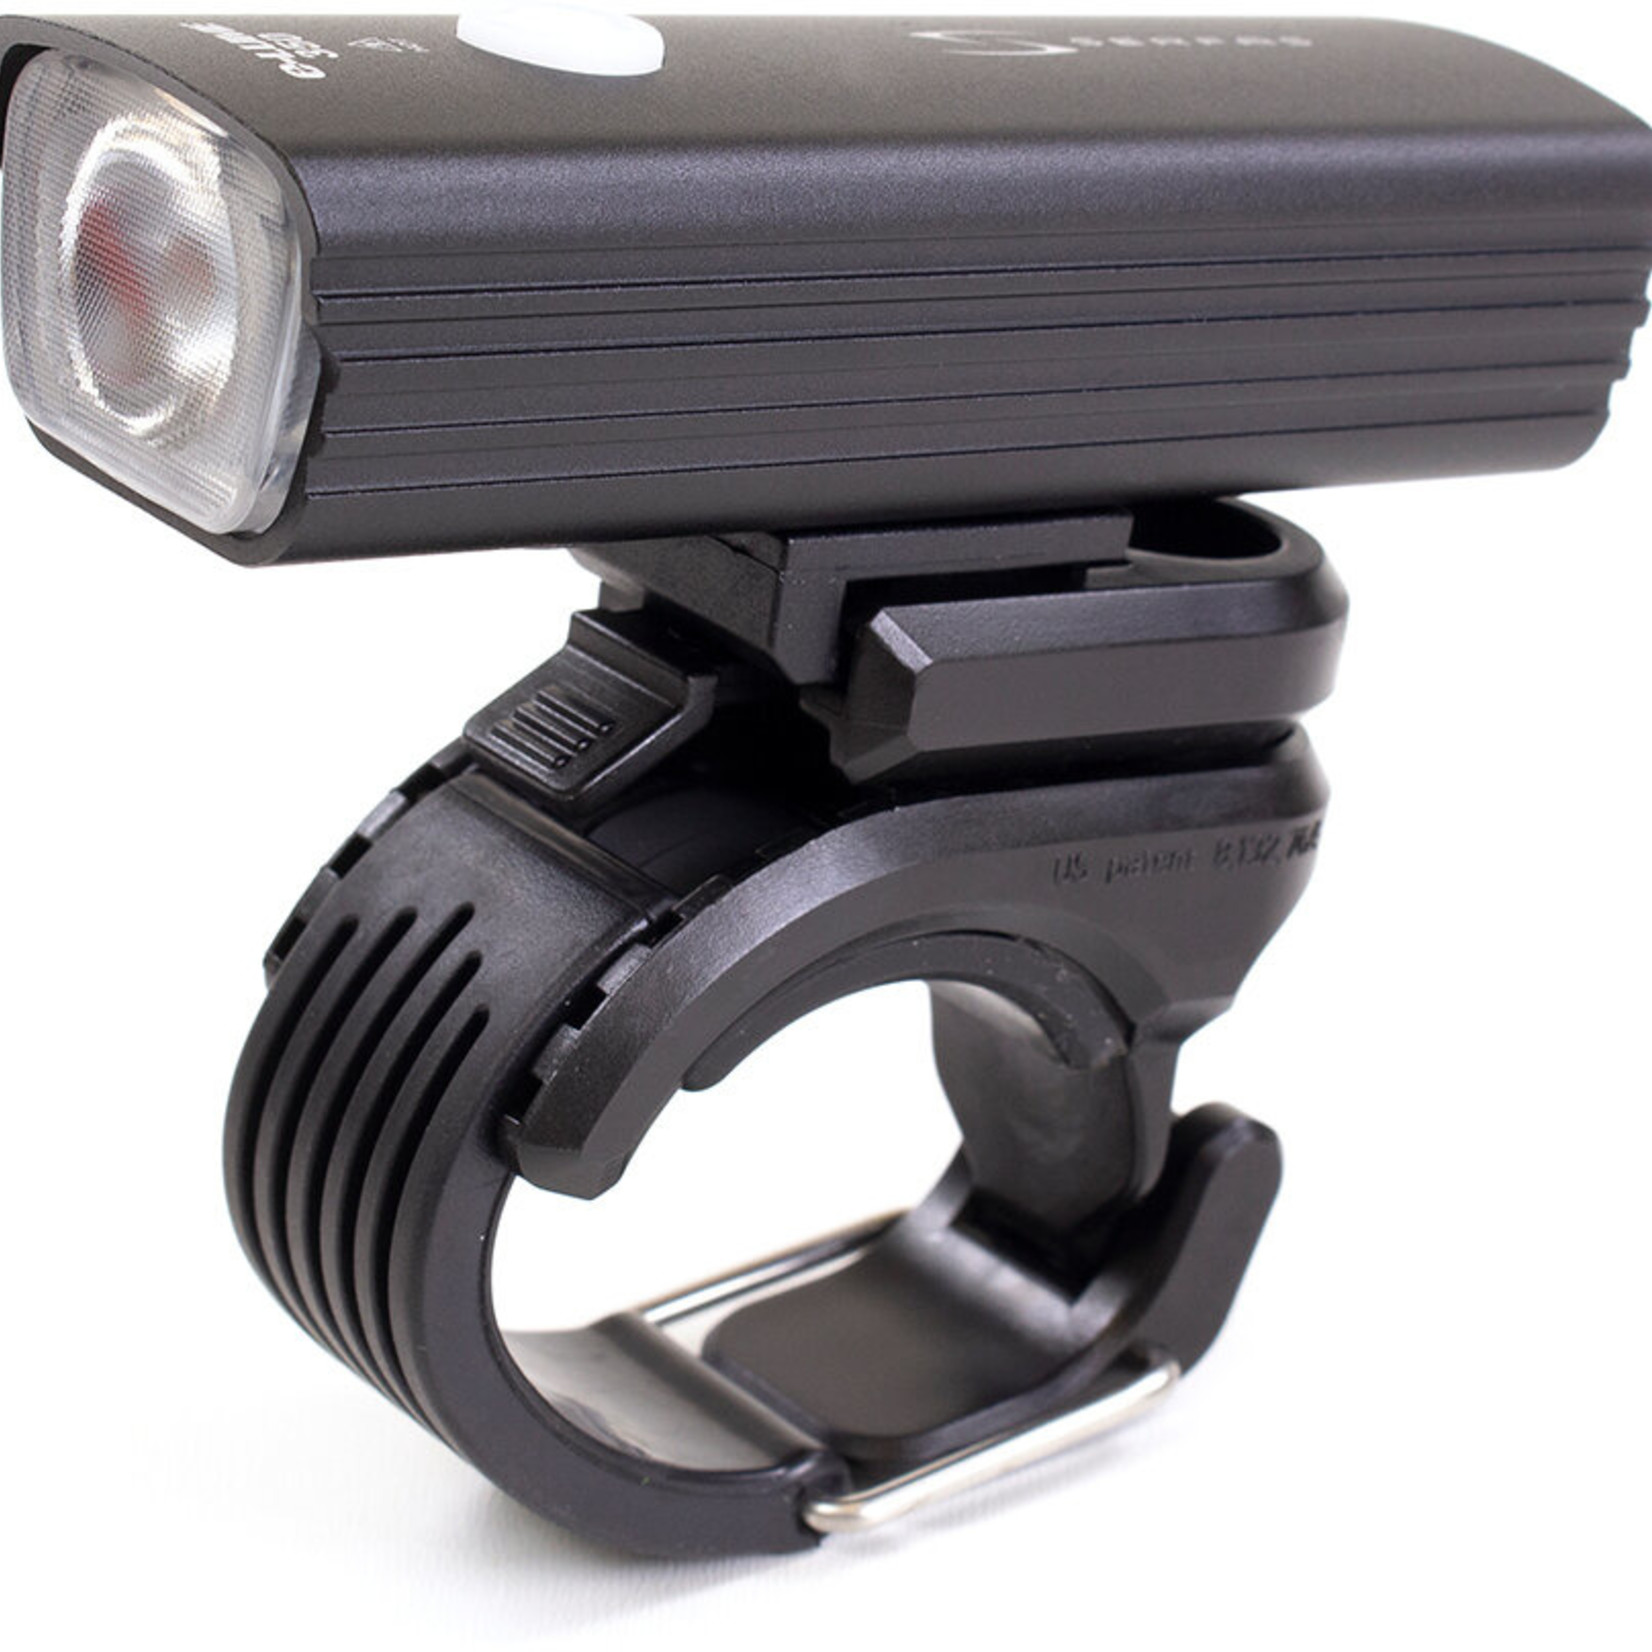 Serfas USL-350 E-Lume 350 Headlight